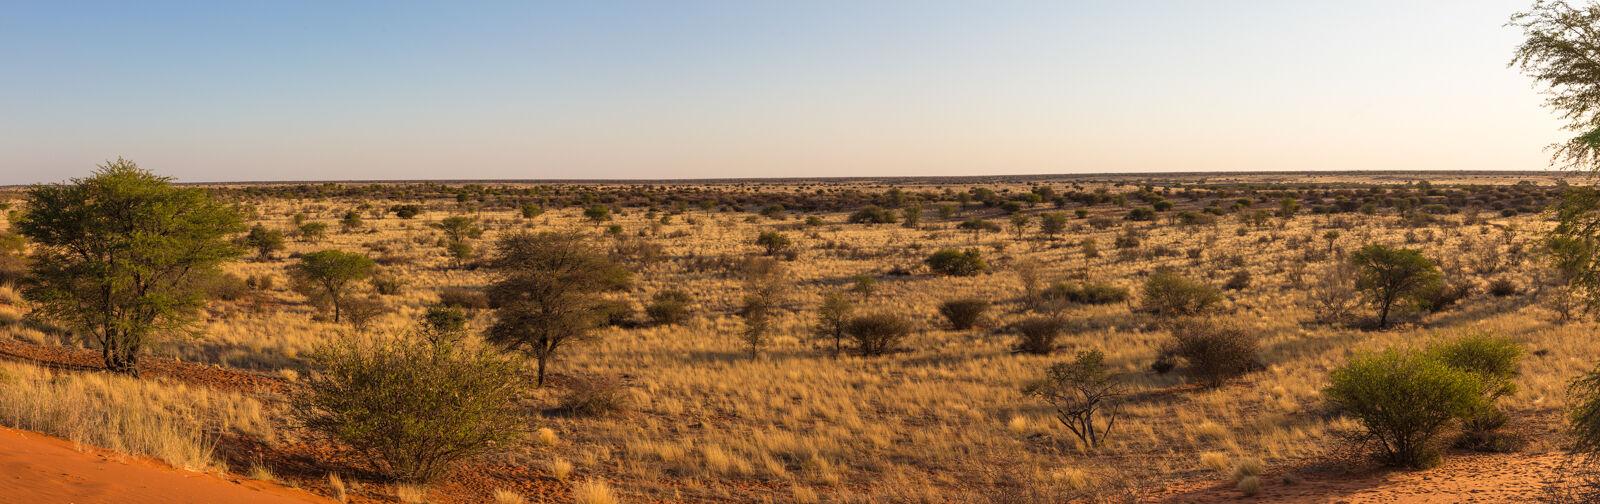 The Kalahari desert, Namibia.